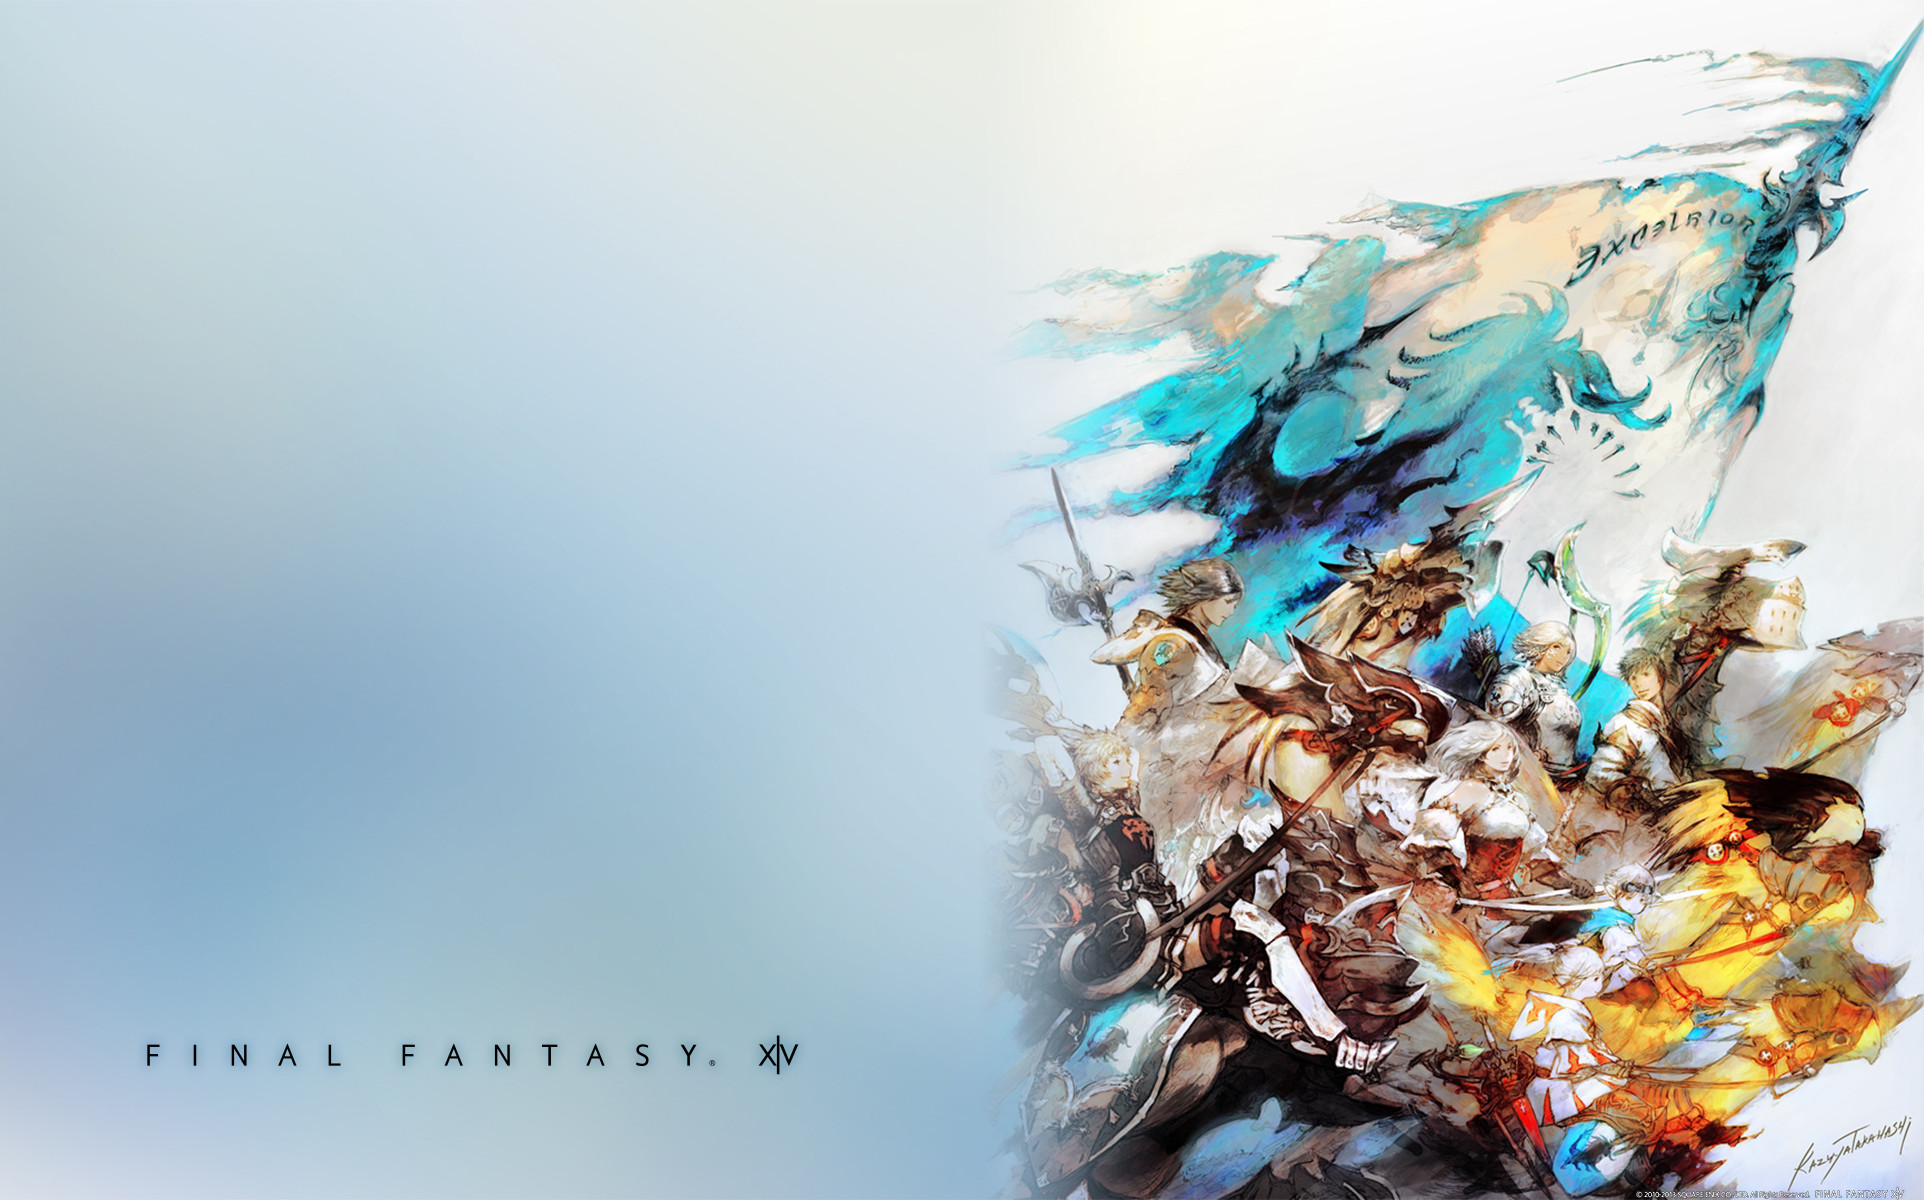 Final Fantasy XIV A Realm Reborn Wallpaper The Final Fantasy